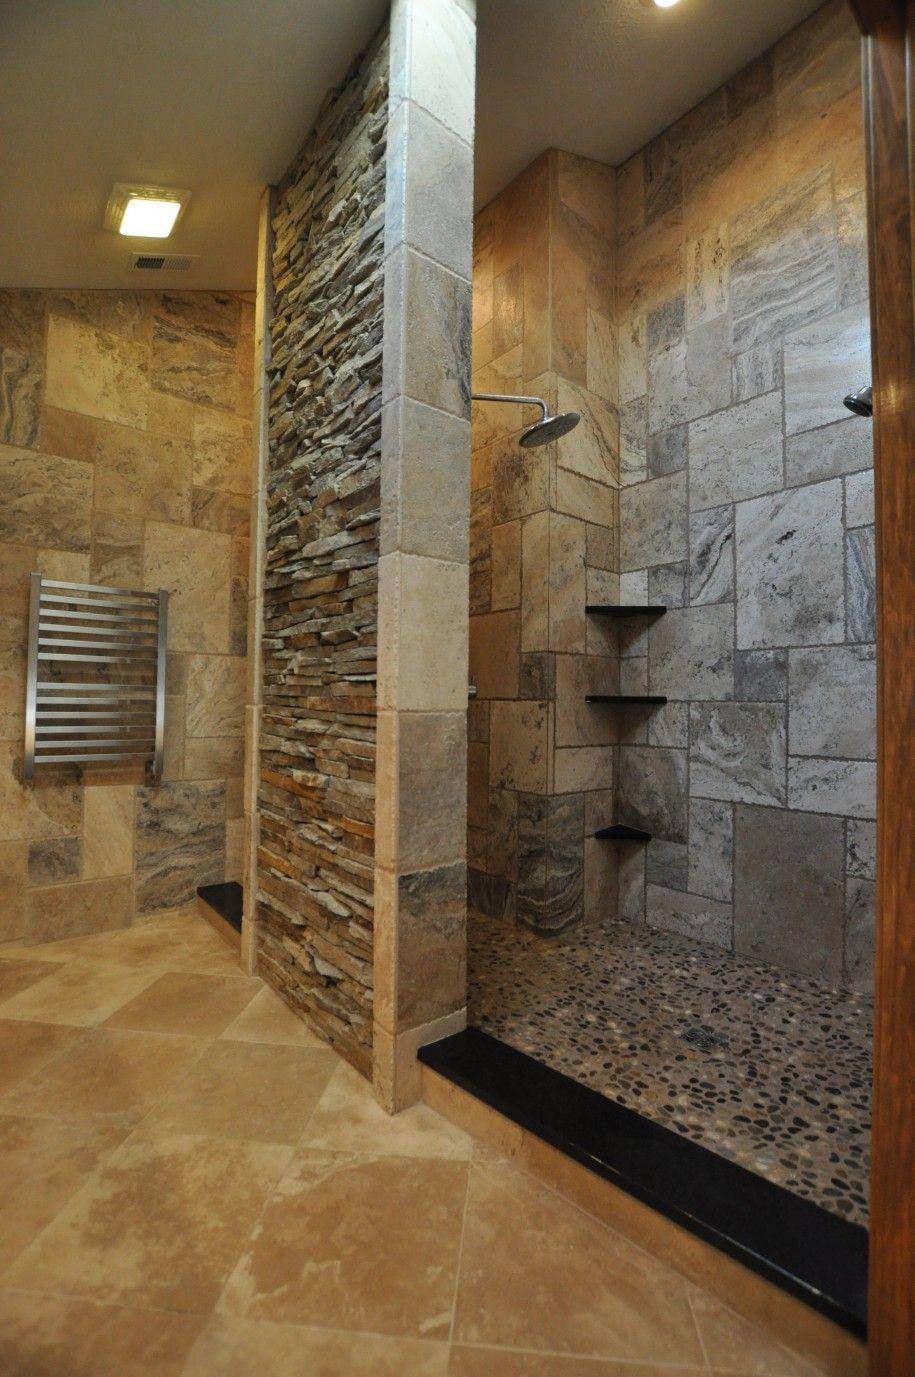 Cool Sculptural Rough Stone Bathroom Design : Cool Sculptural Rough ...